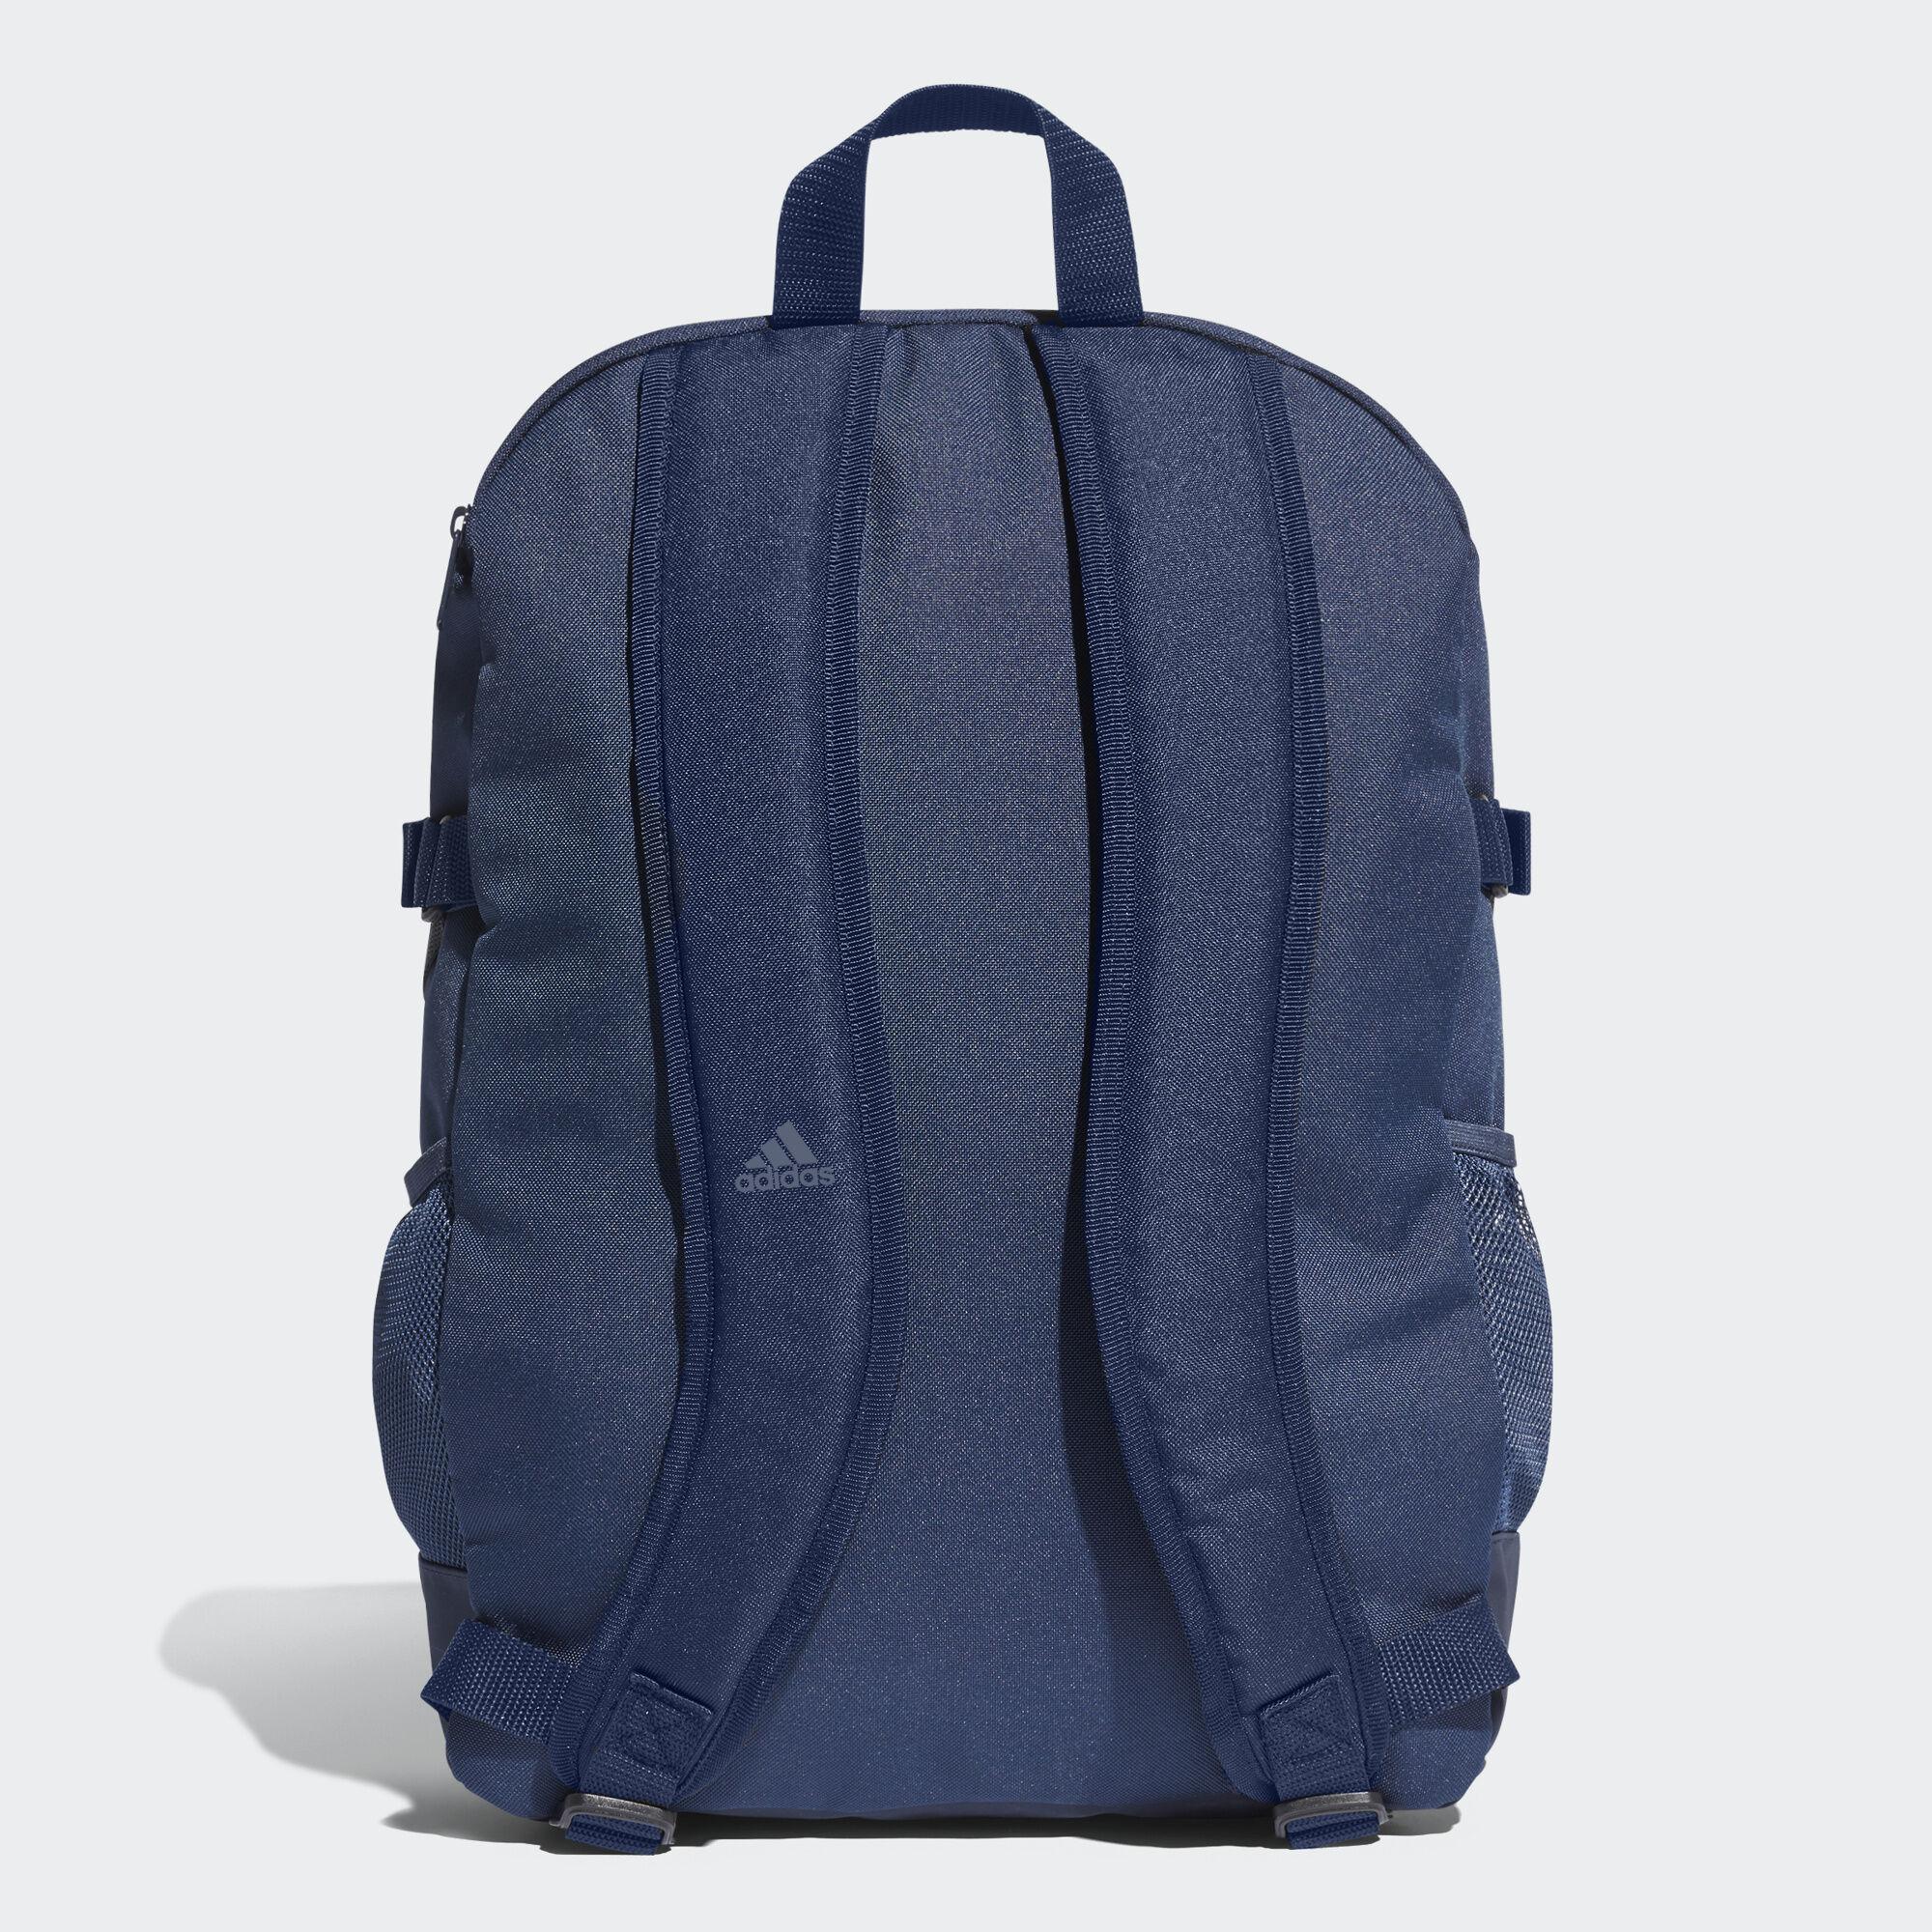 03eacfd91582 adidas 3-Stripes Power Backpack Medium - Black